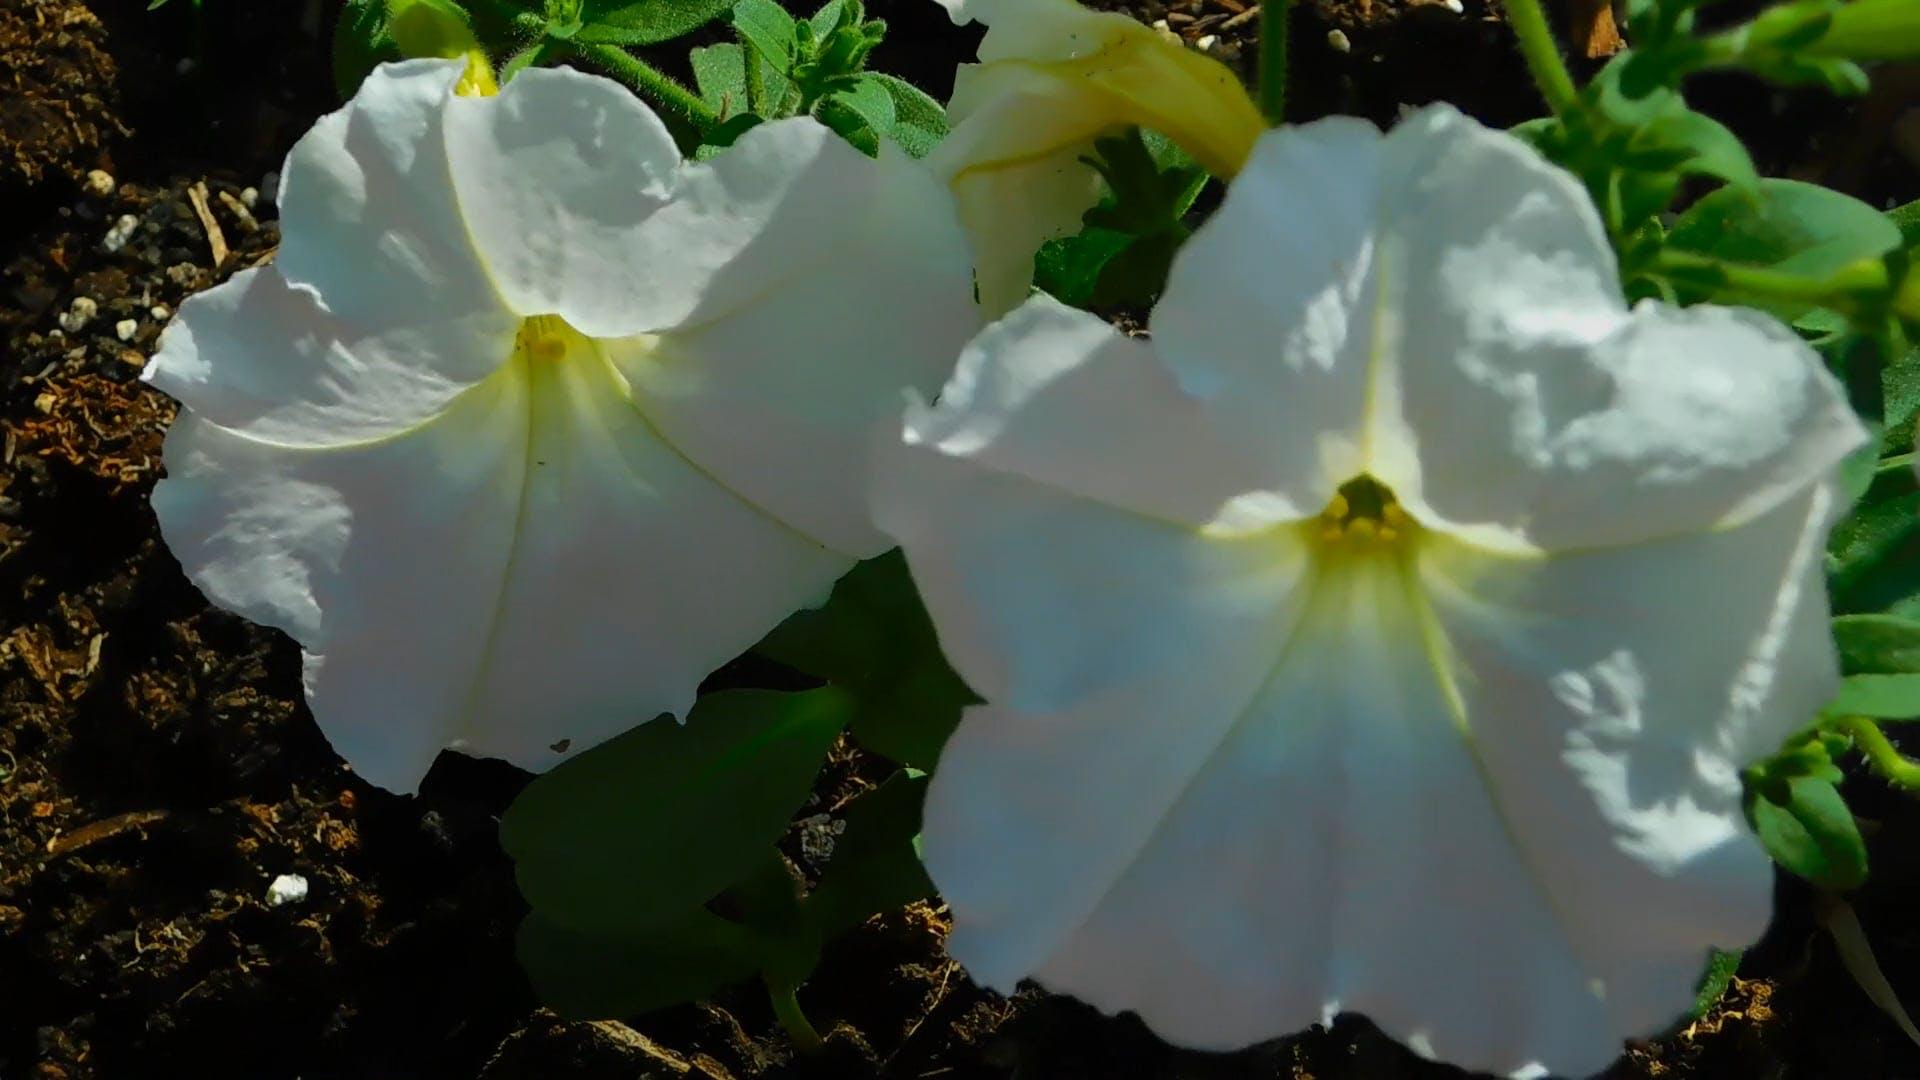 Close-Up video of White Petunia